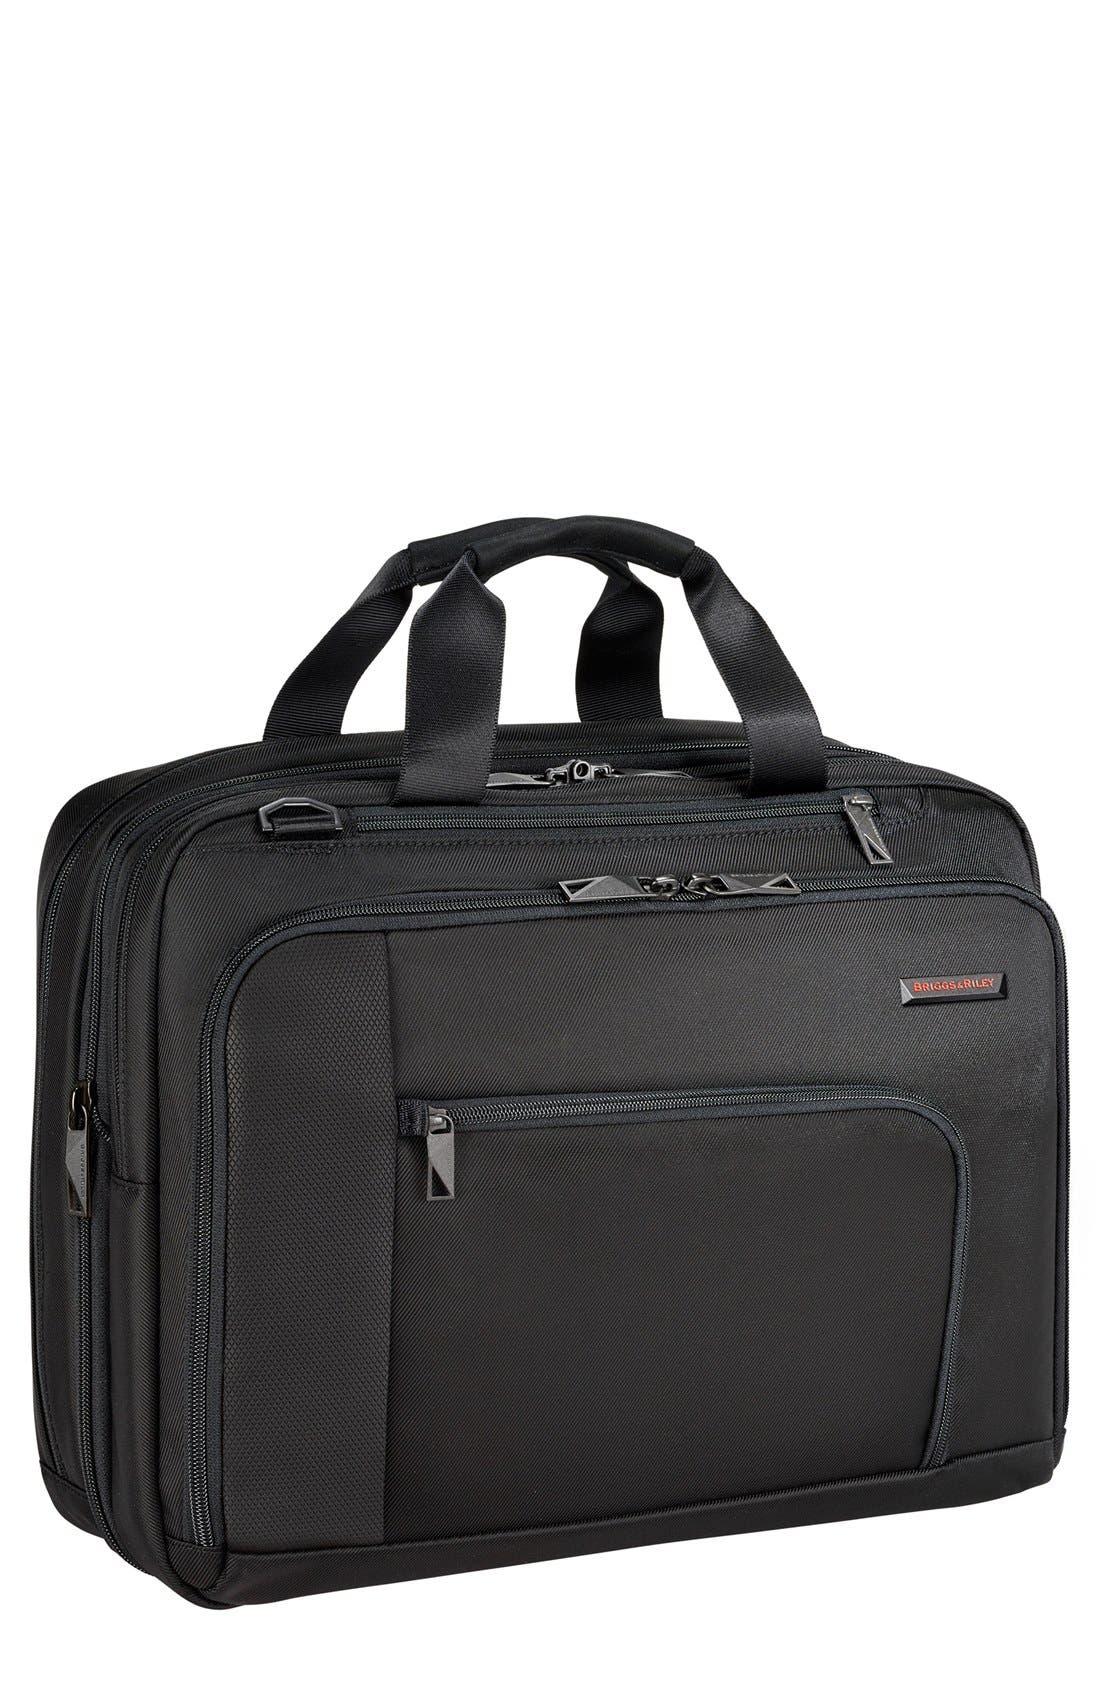 Main Image - Briggs & Riley Verb - Adapt Expandable Briefcase